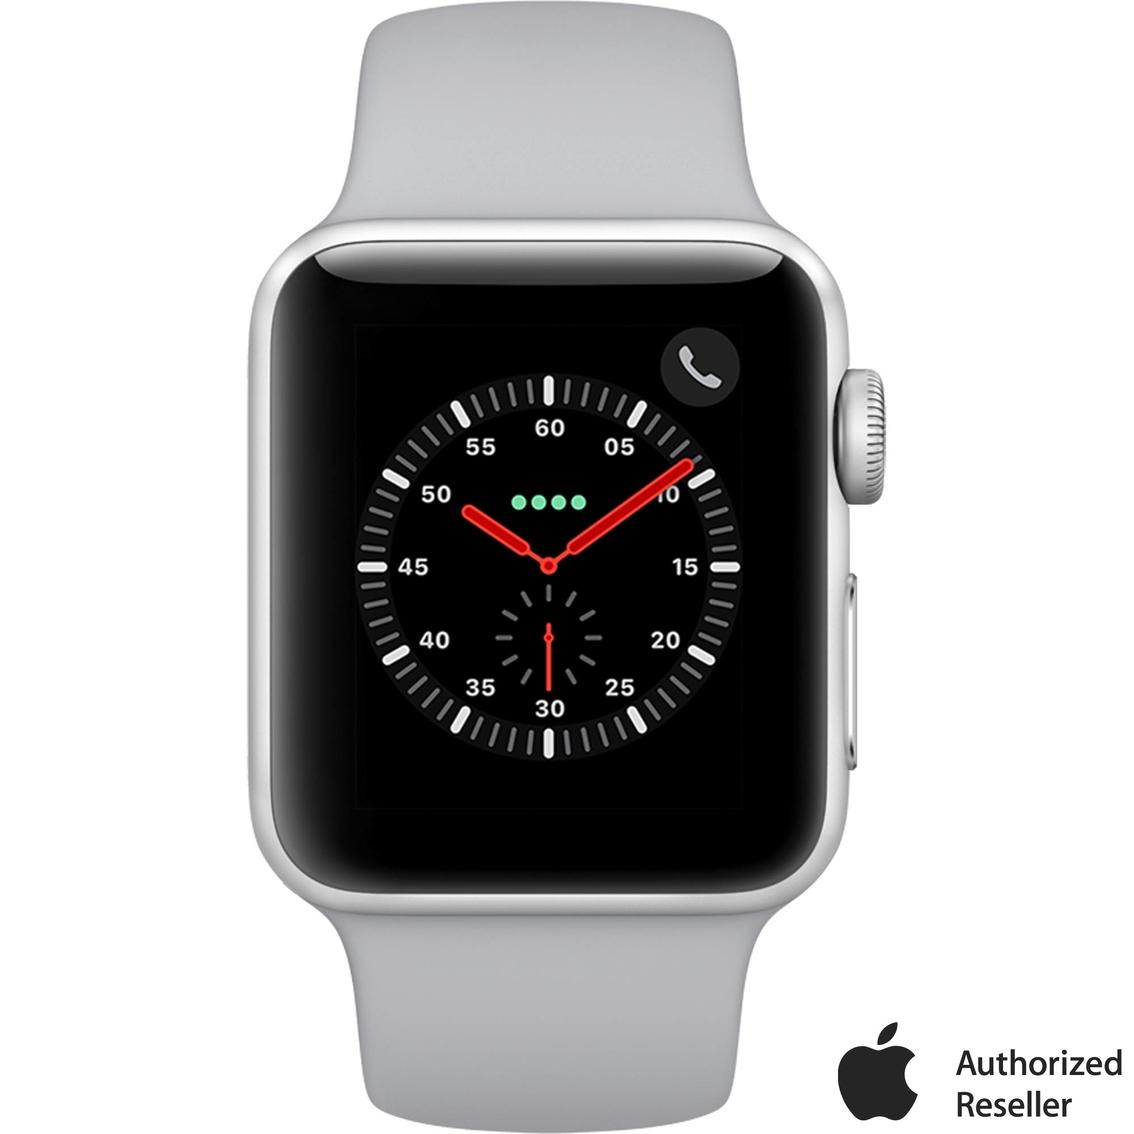 uk availability fea7d 4e5d9 Apple Watch Series 3 Gps + Cellular Silver Aluminum Case With Fog ...